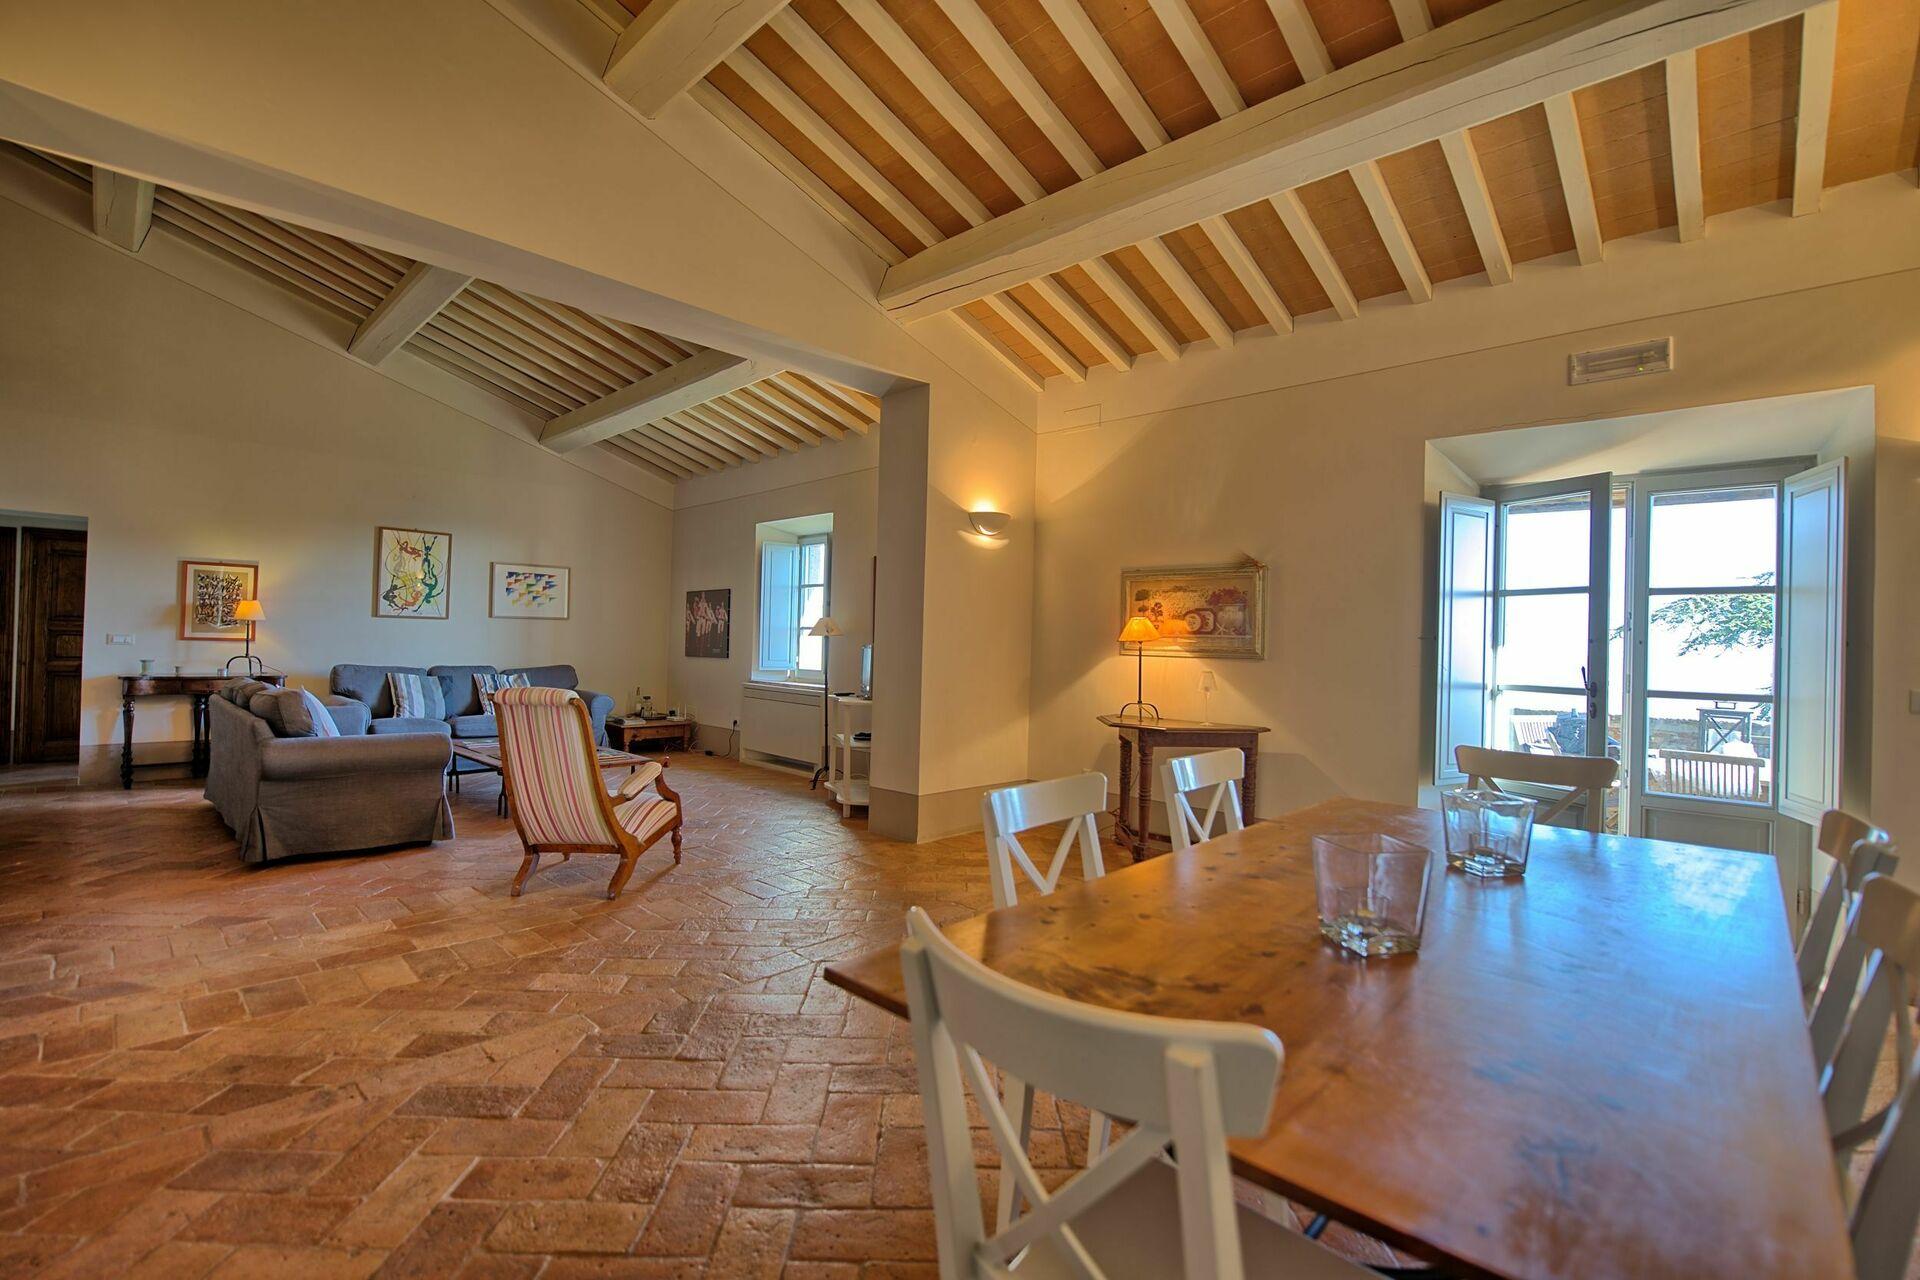 Casa Olivia, Villa vacation rental in Piazze Tuscany - 6 sleeps in 3 ...